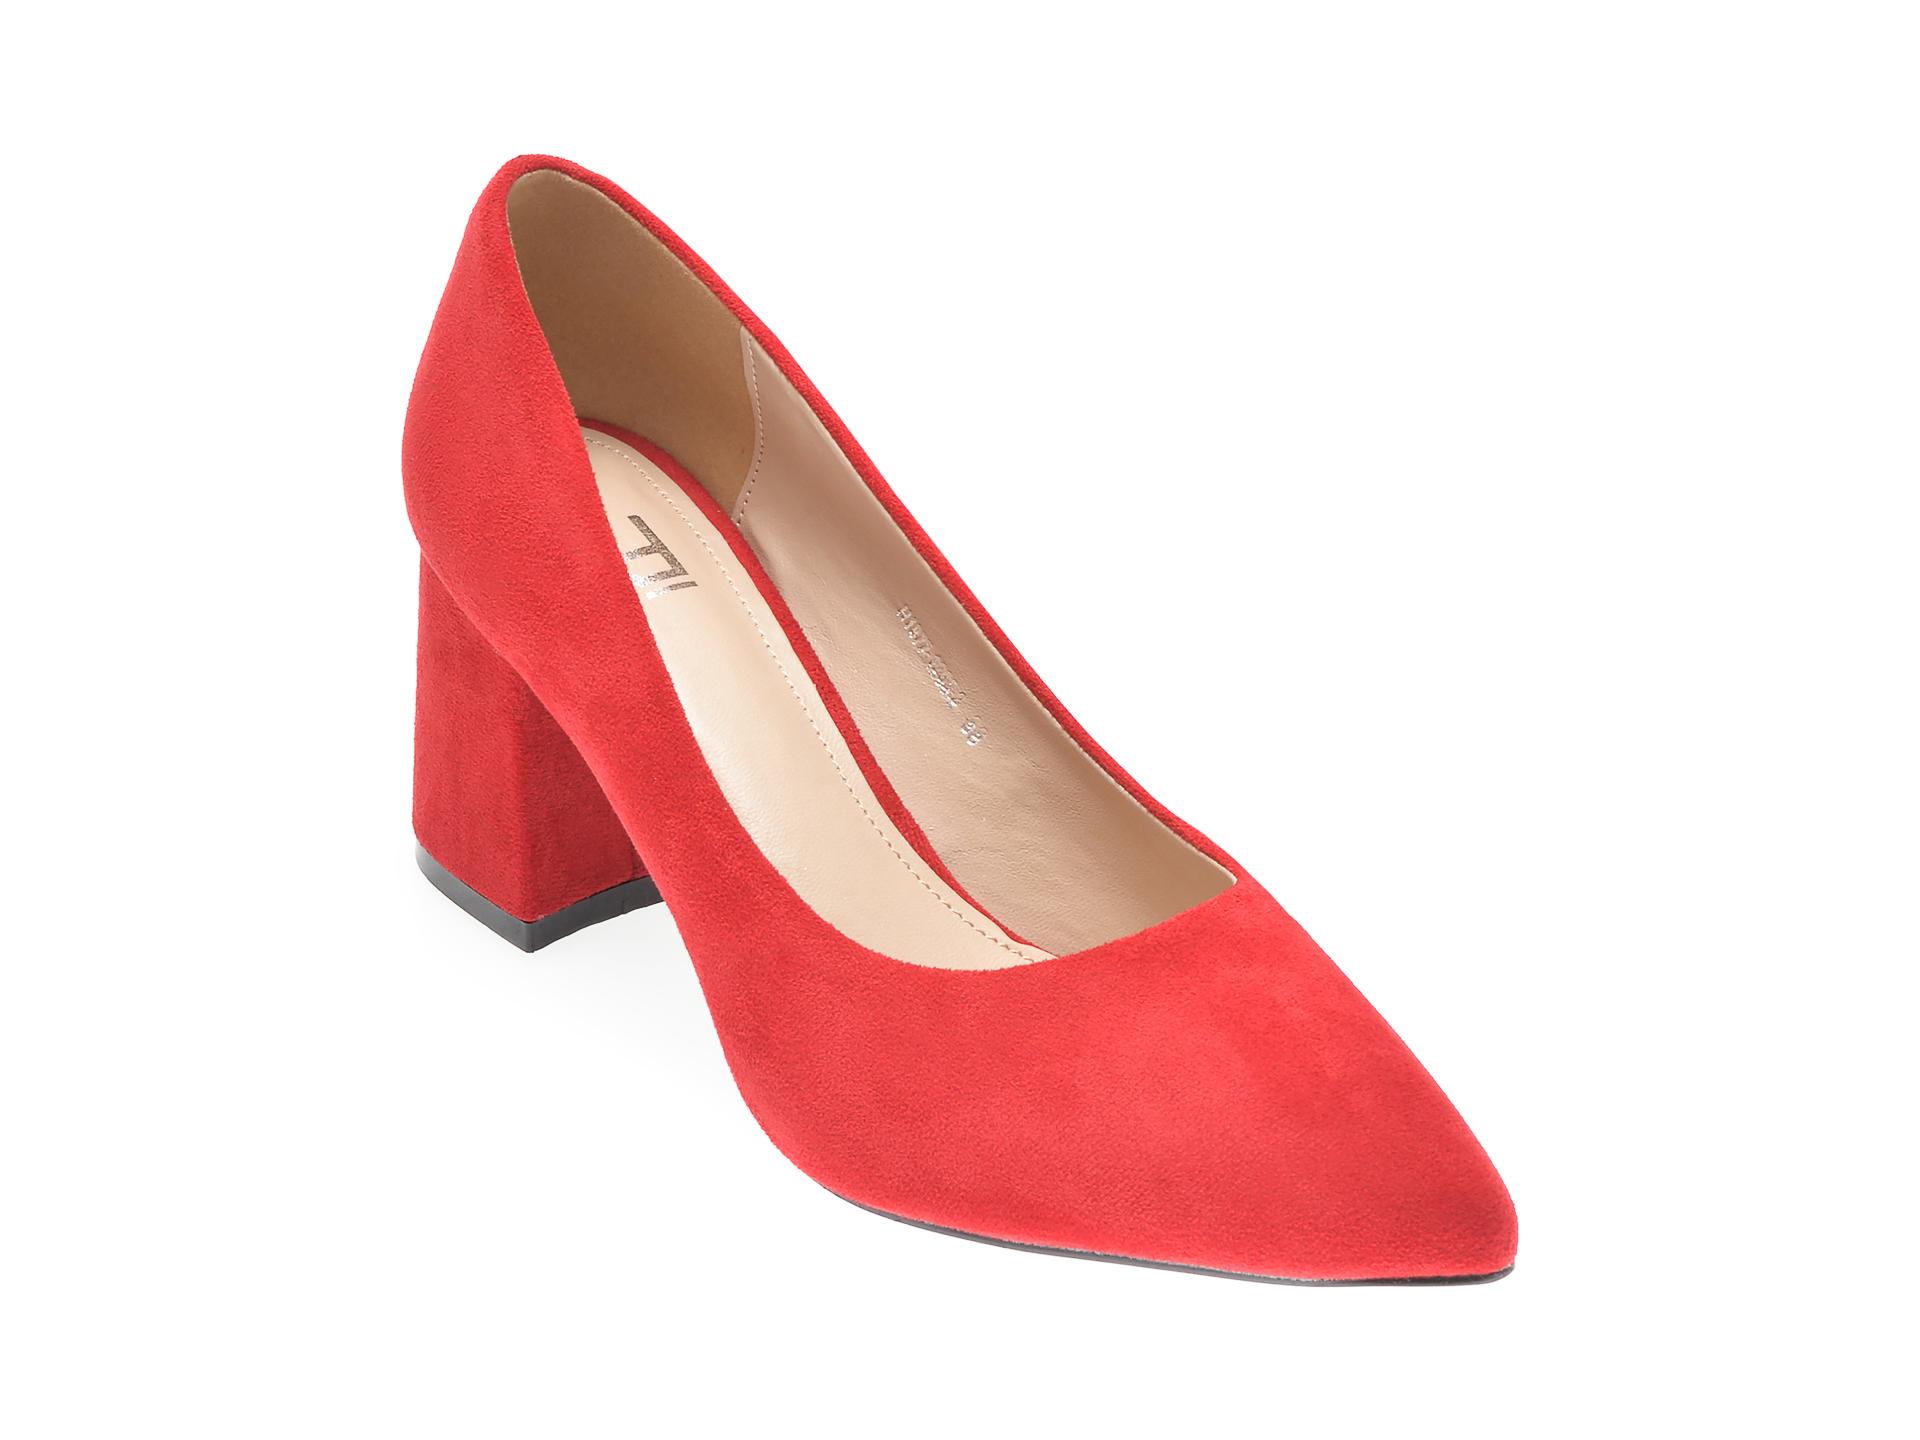 Pantofi RIO FIORE rosii, H1877, din piele ecologica imagine